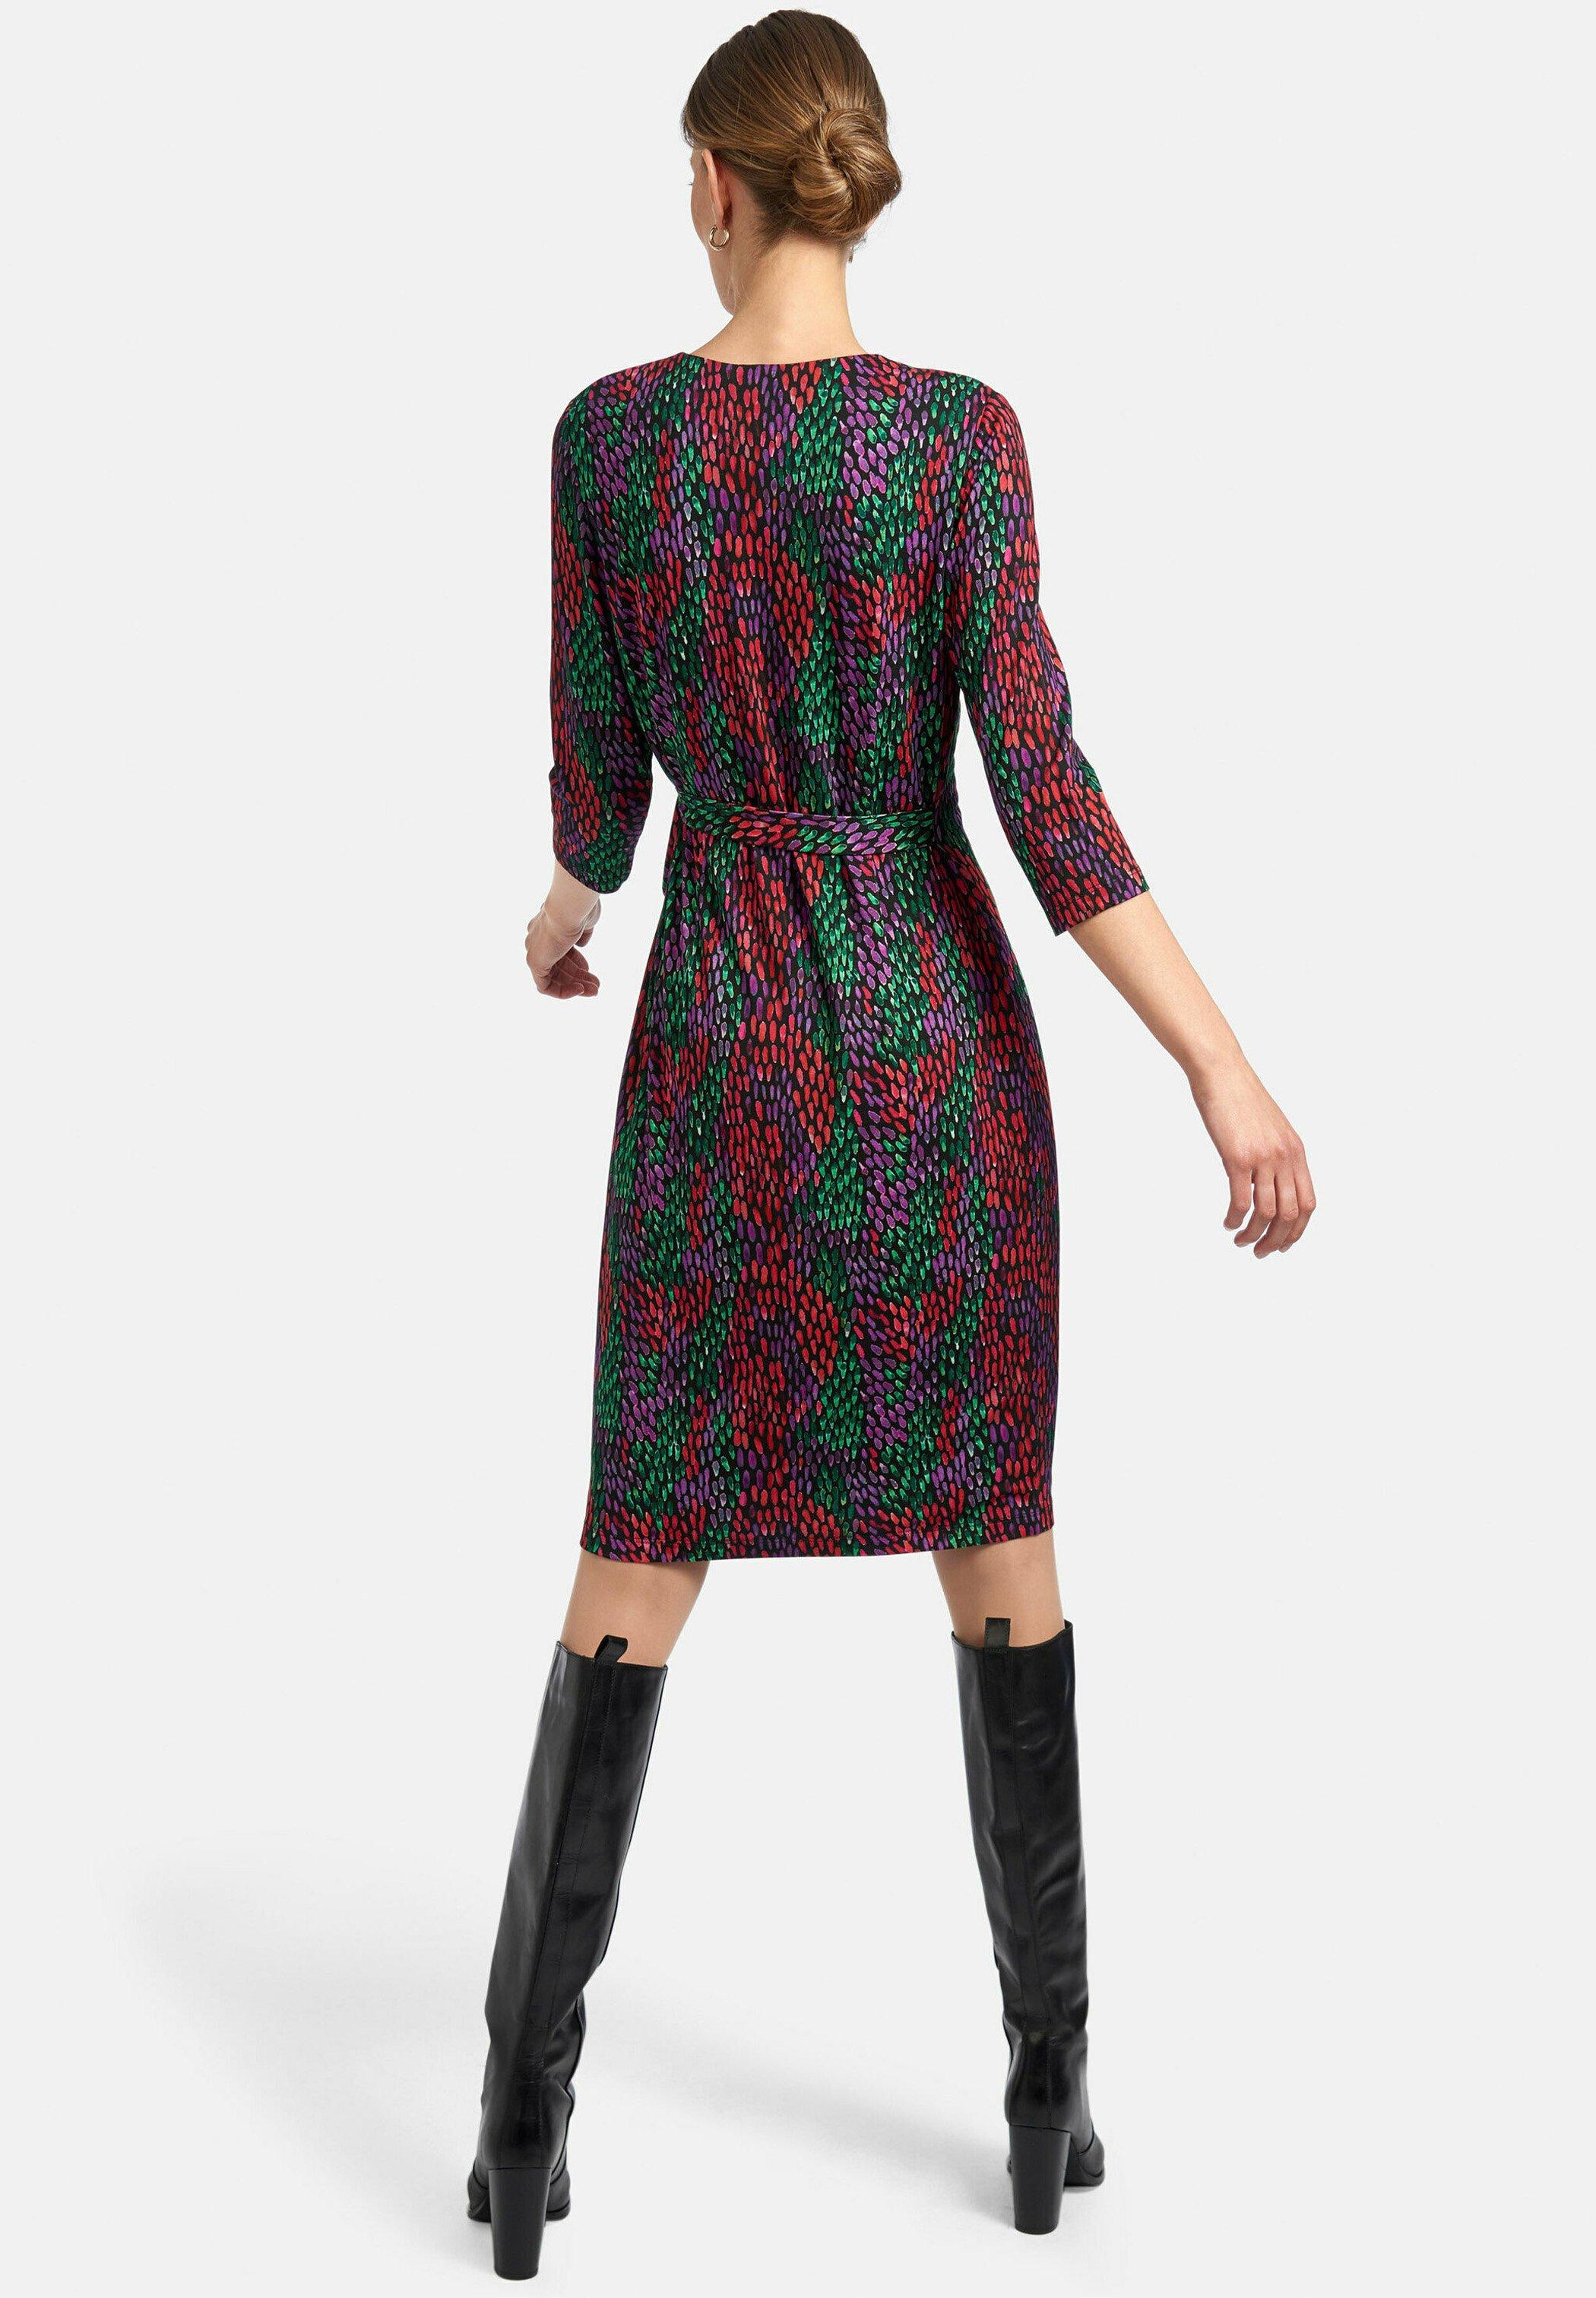 Uta Raasch Jerseykleid multicolor/mehrfarbig